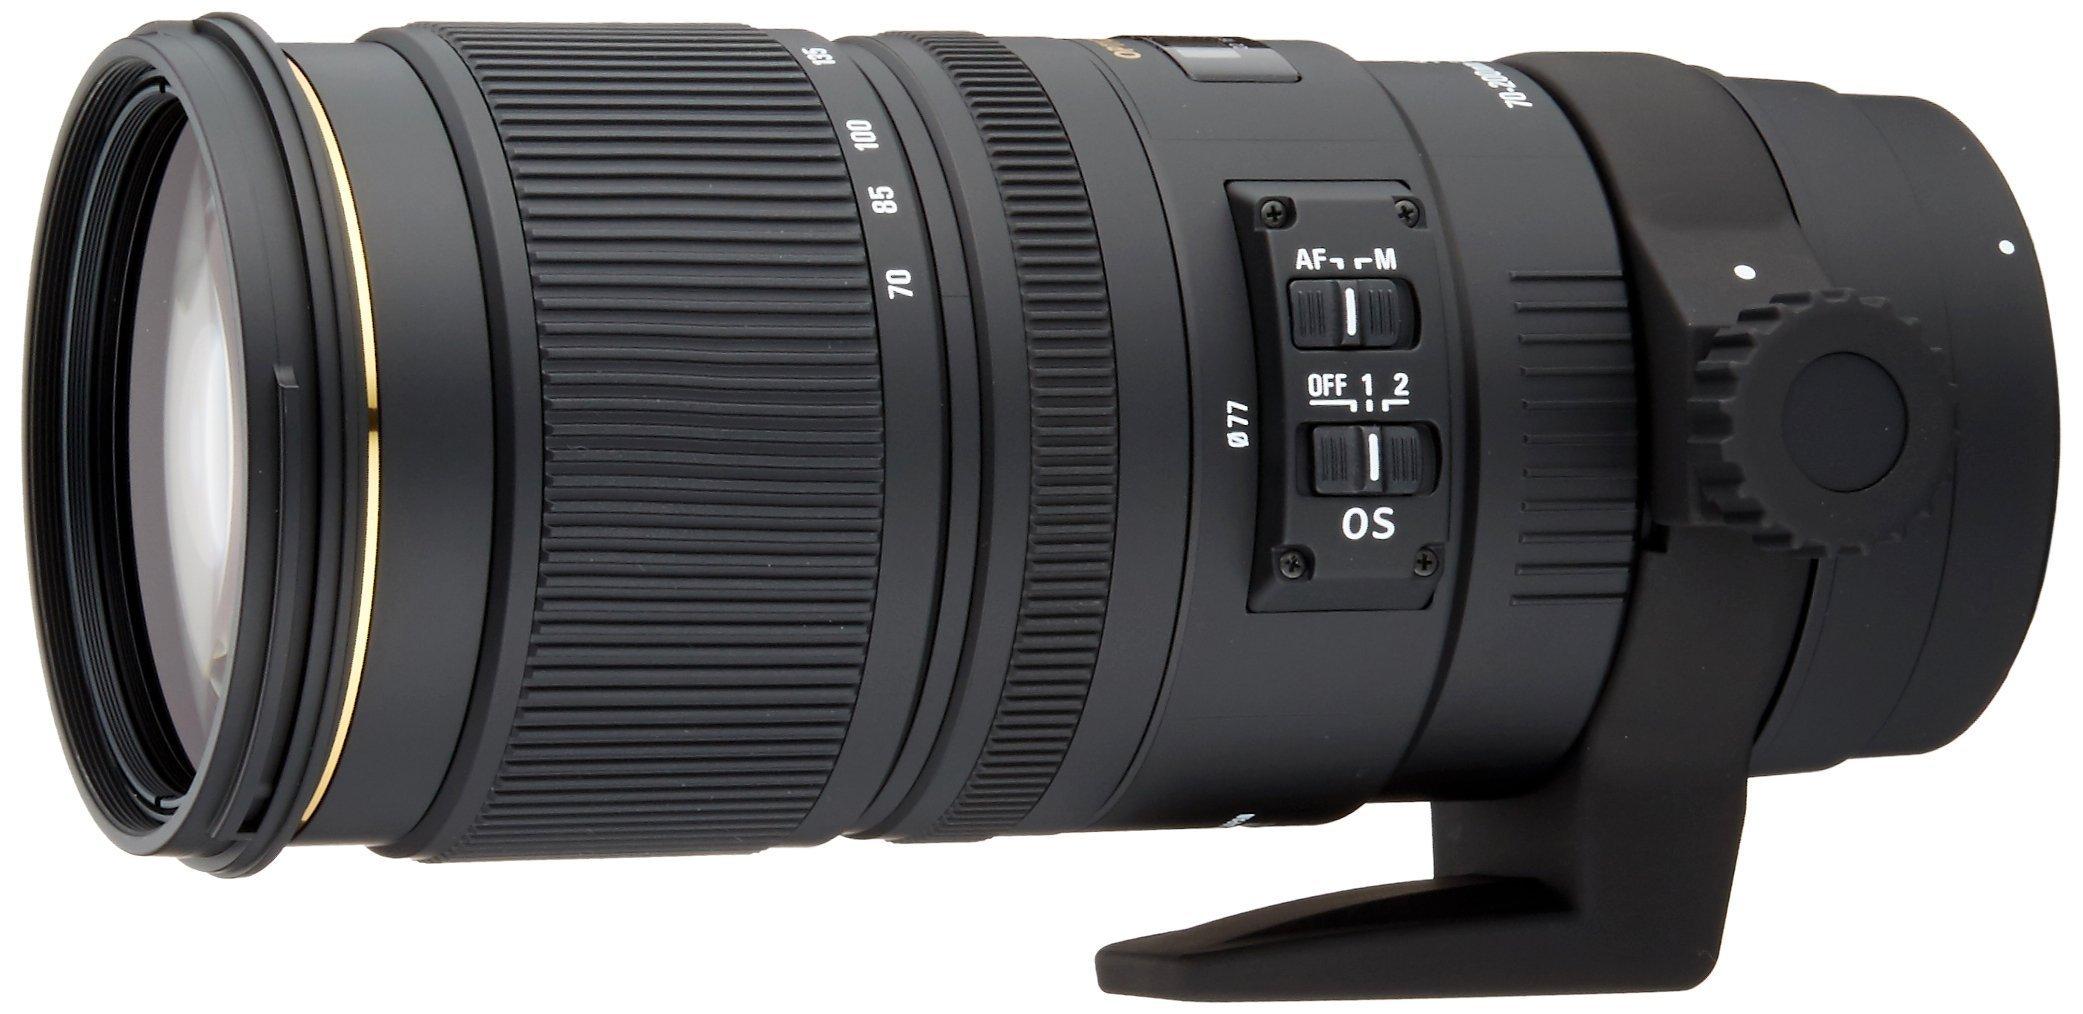 Sigma 70-200mm f/2.8 APO EX DG HSM OS FLD Telephoto Zoom Lens for Nikon (589306) (Renewed) by Sigma